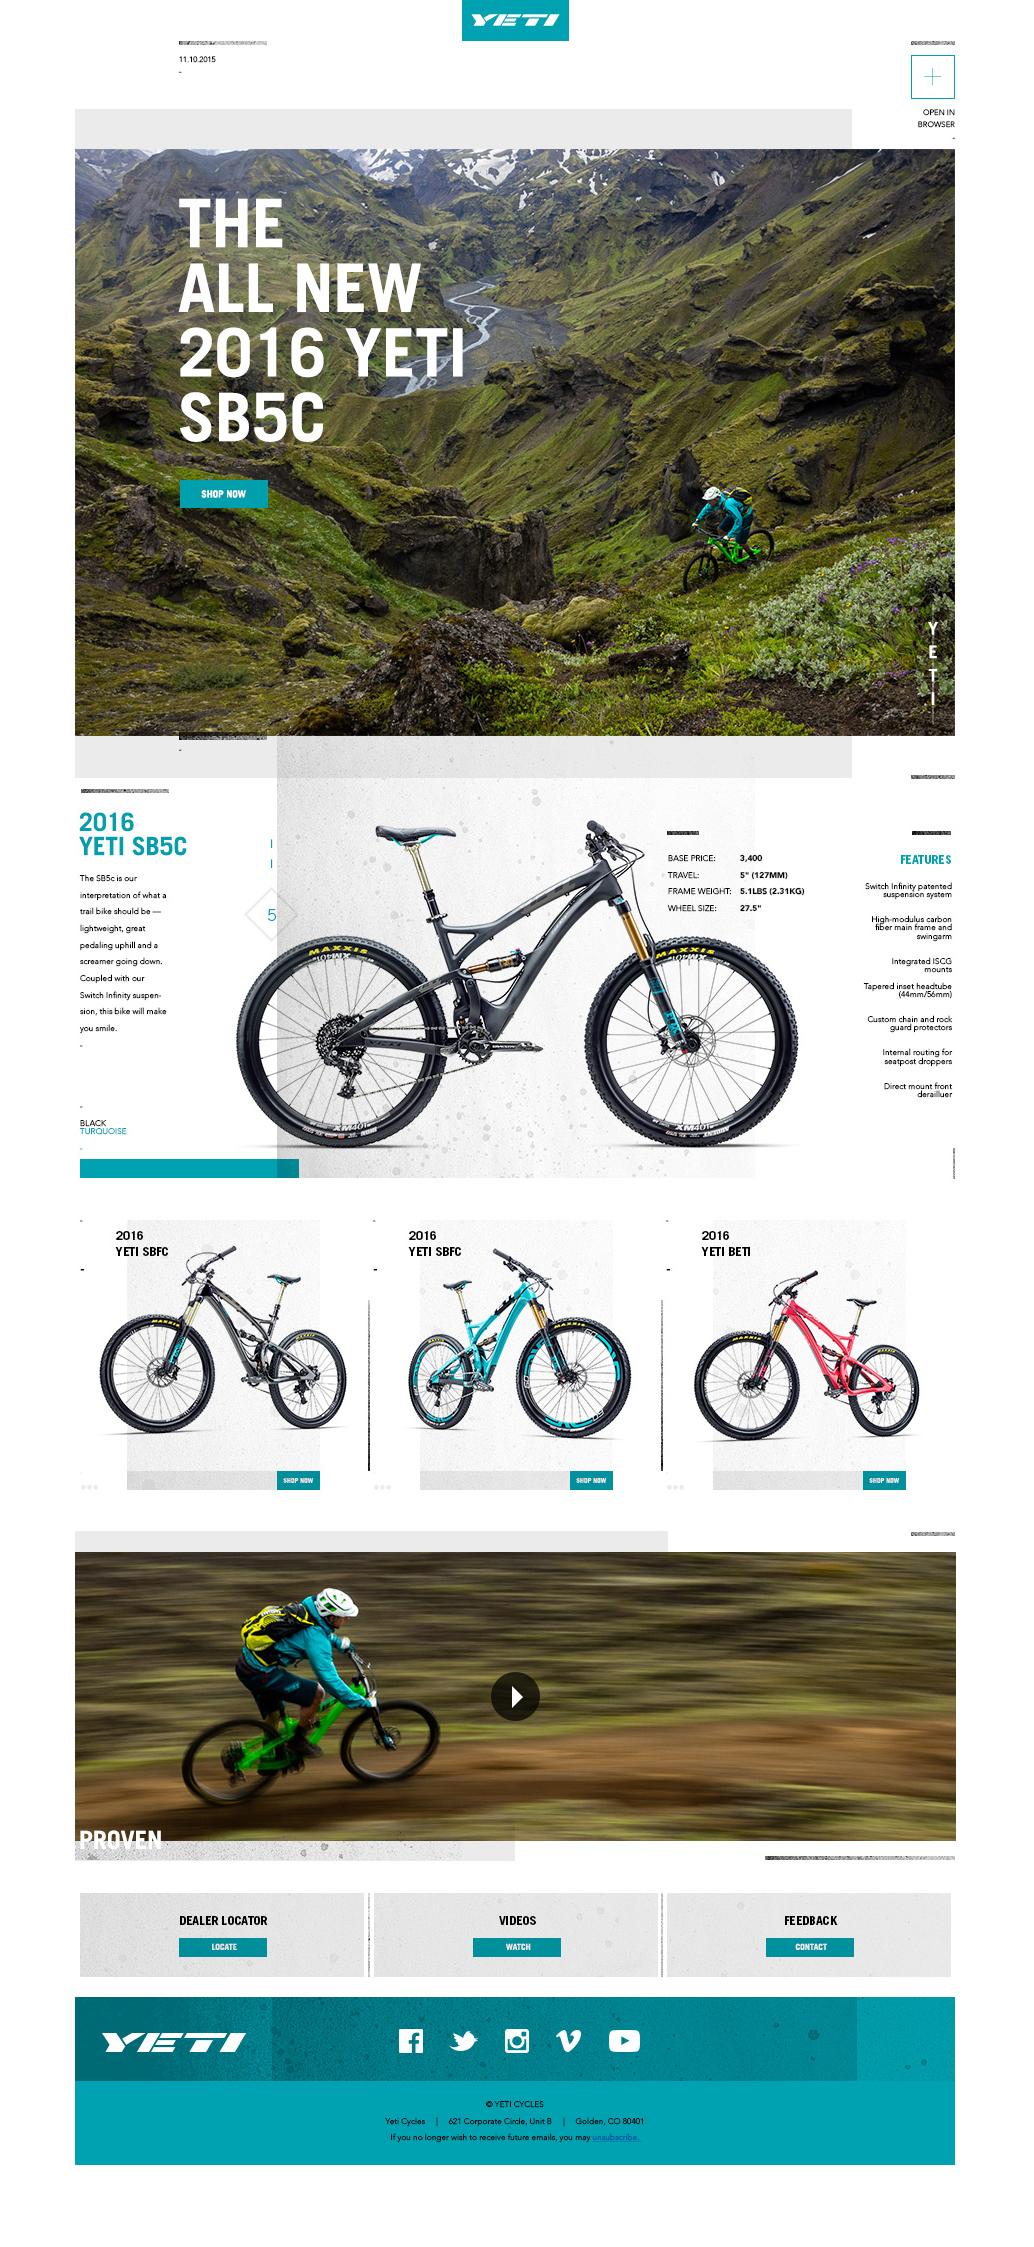 Andrew_Langford_Design_Yeti_1.png